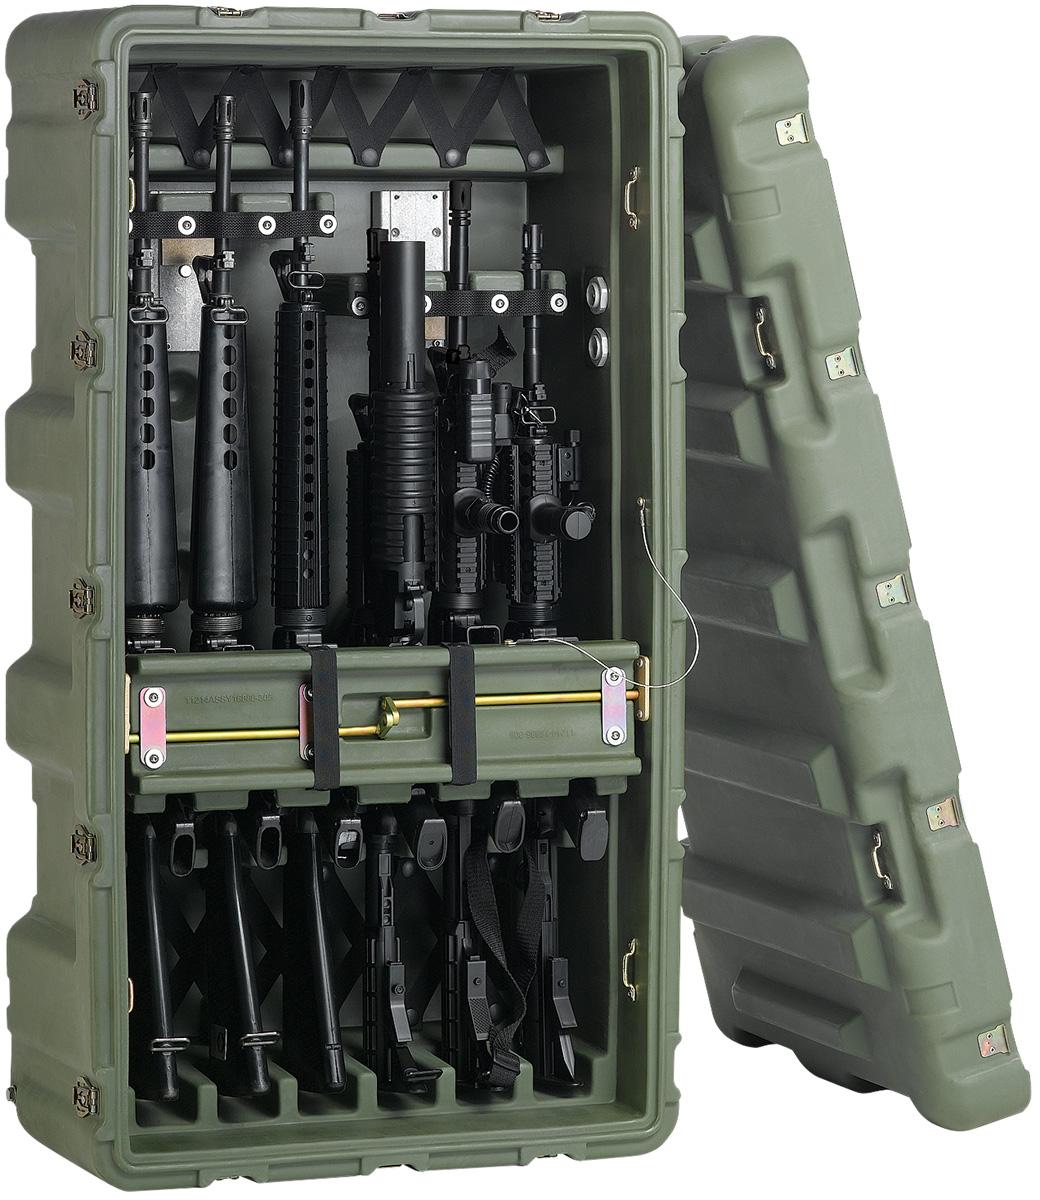 pelican usa military m4 m16 hardcase